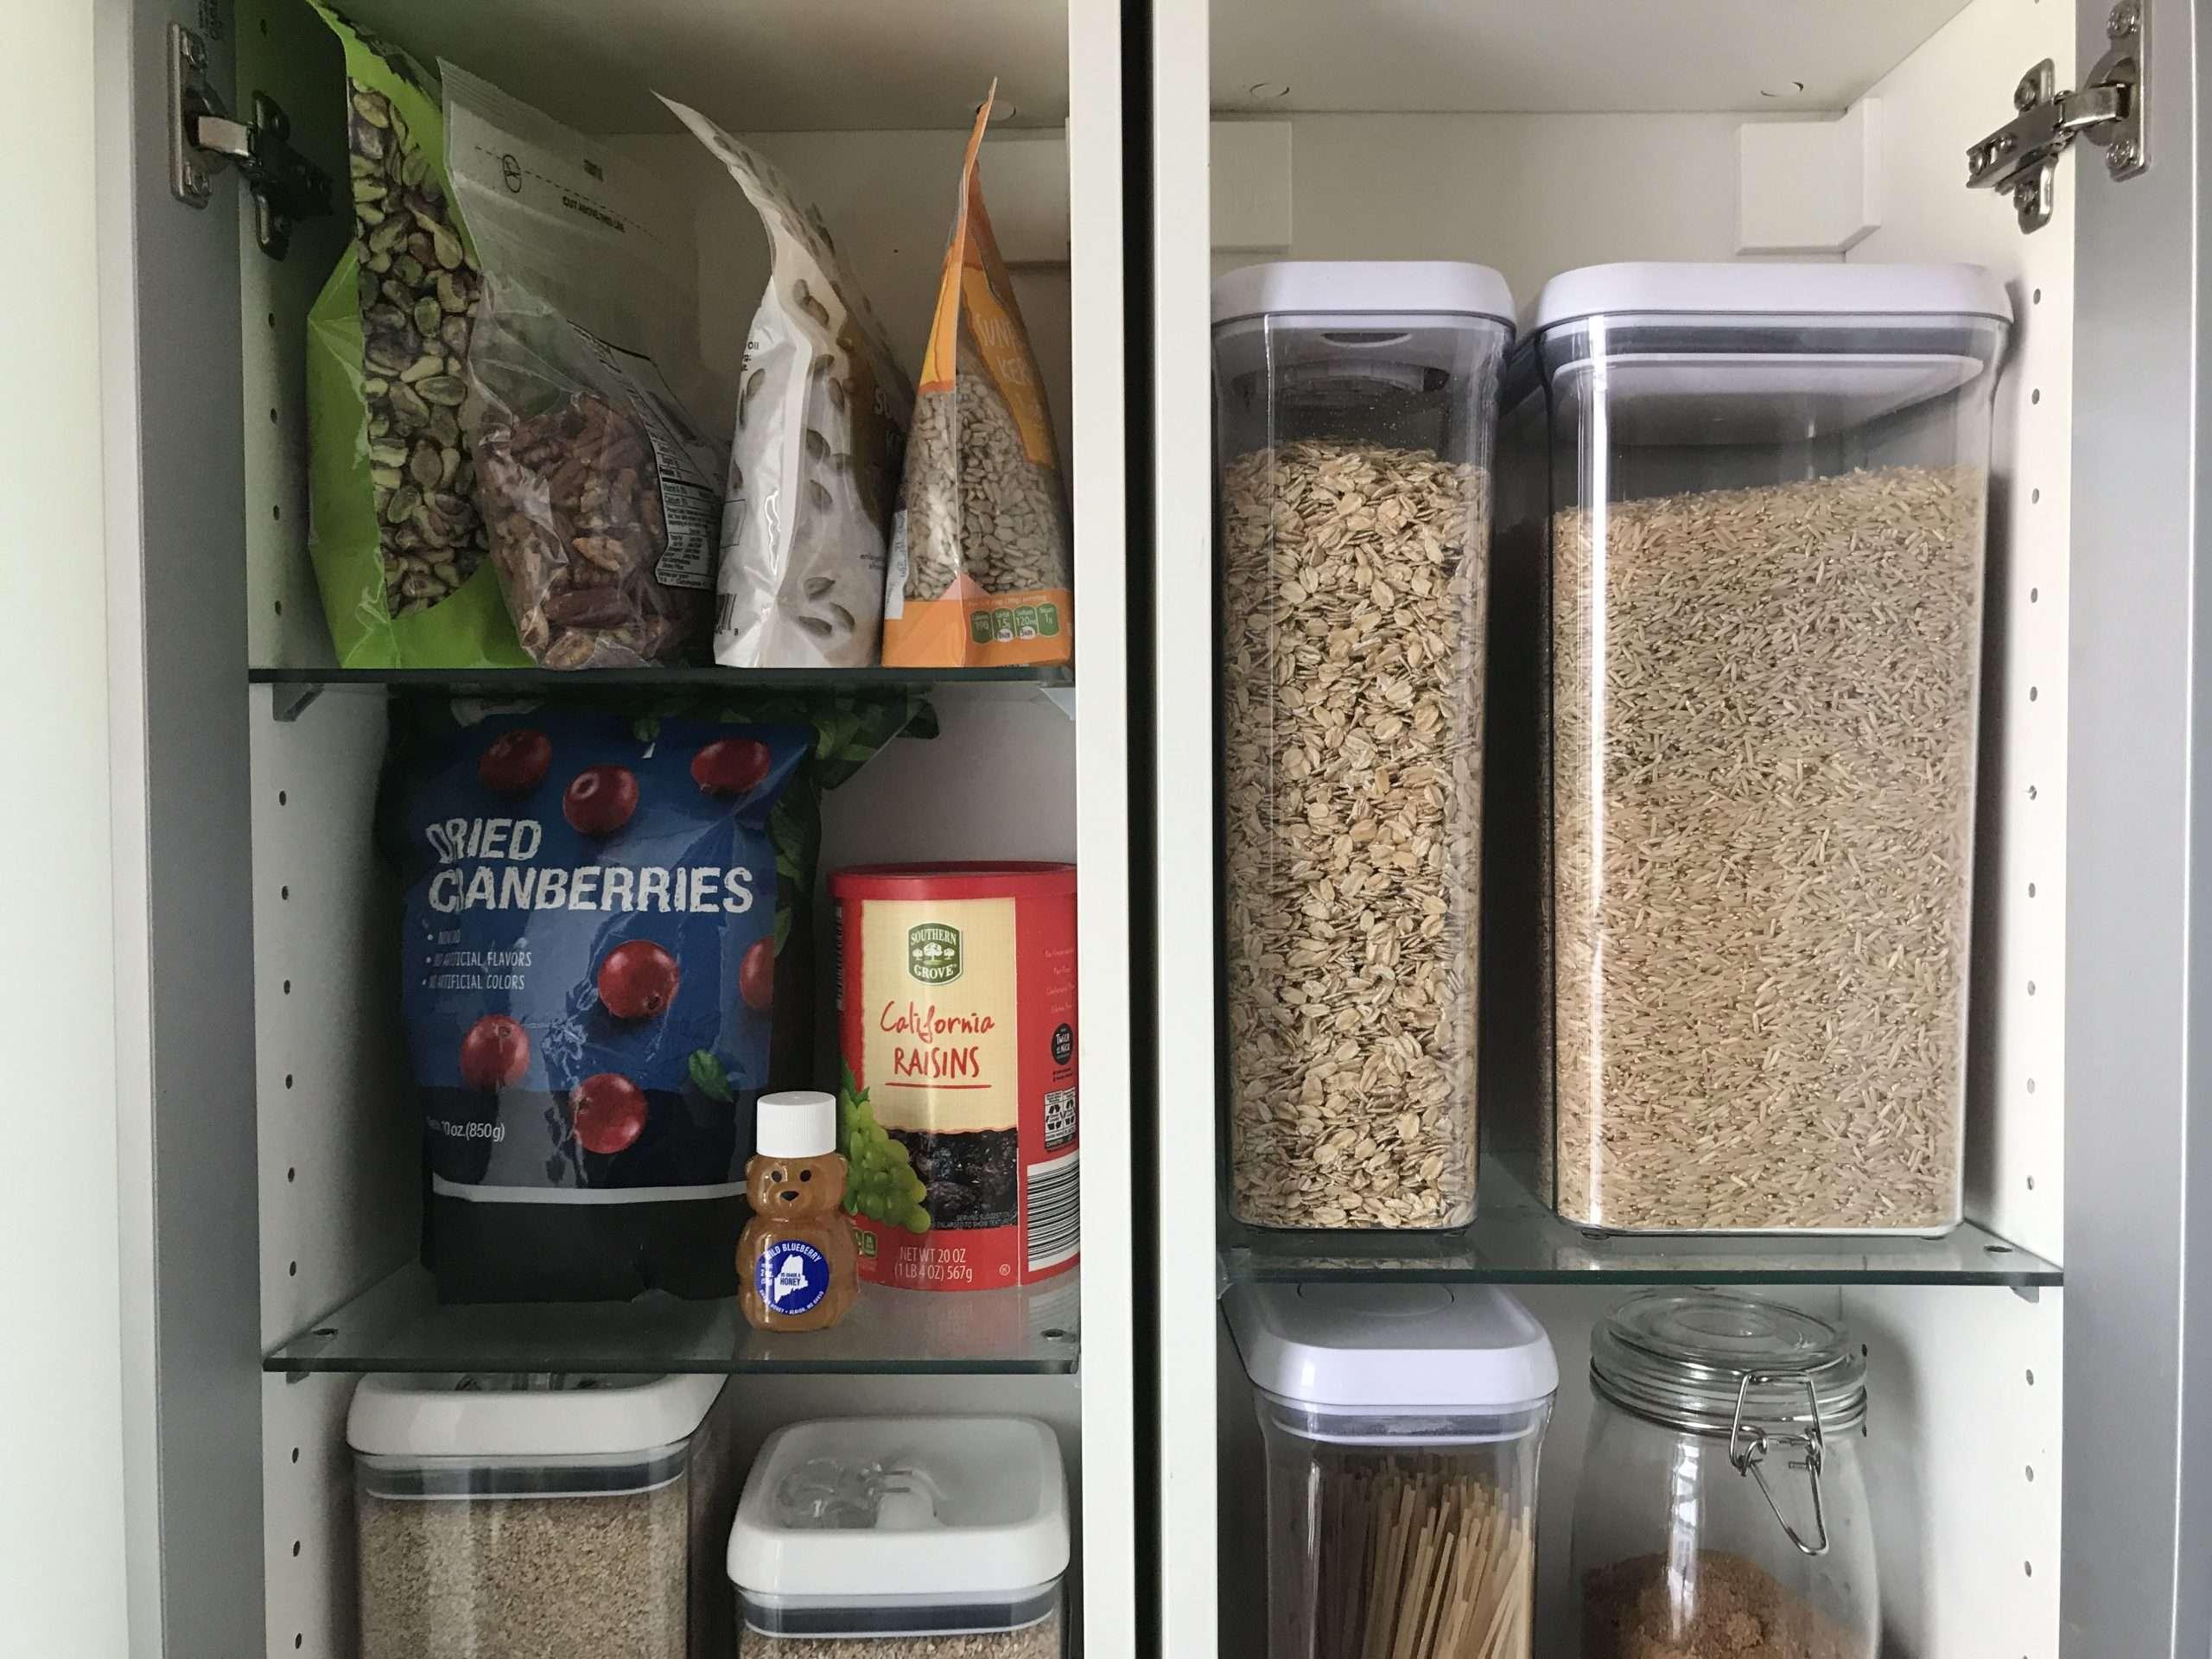 Keep food pantry cool, dry, dark during COVID 19